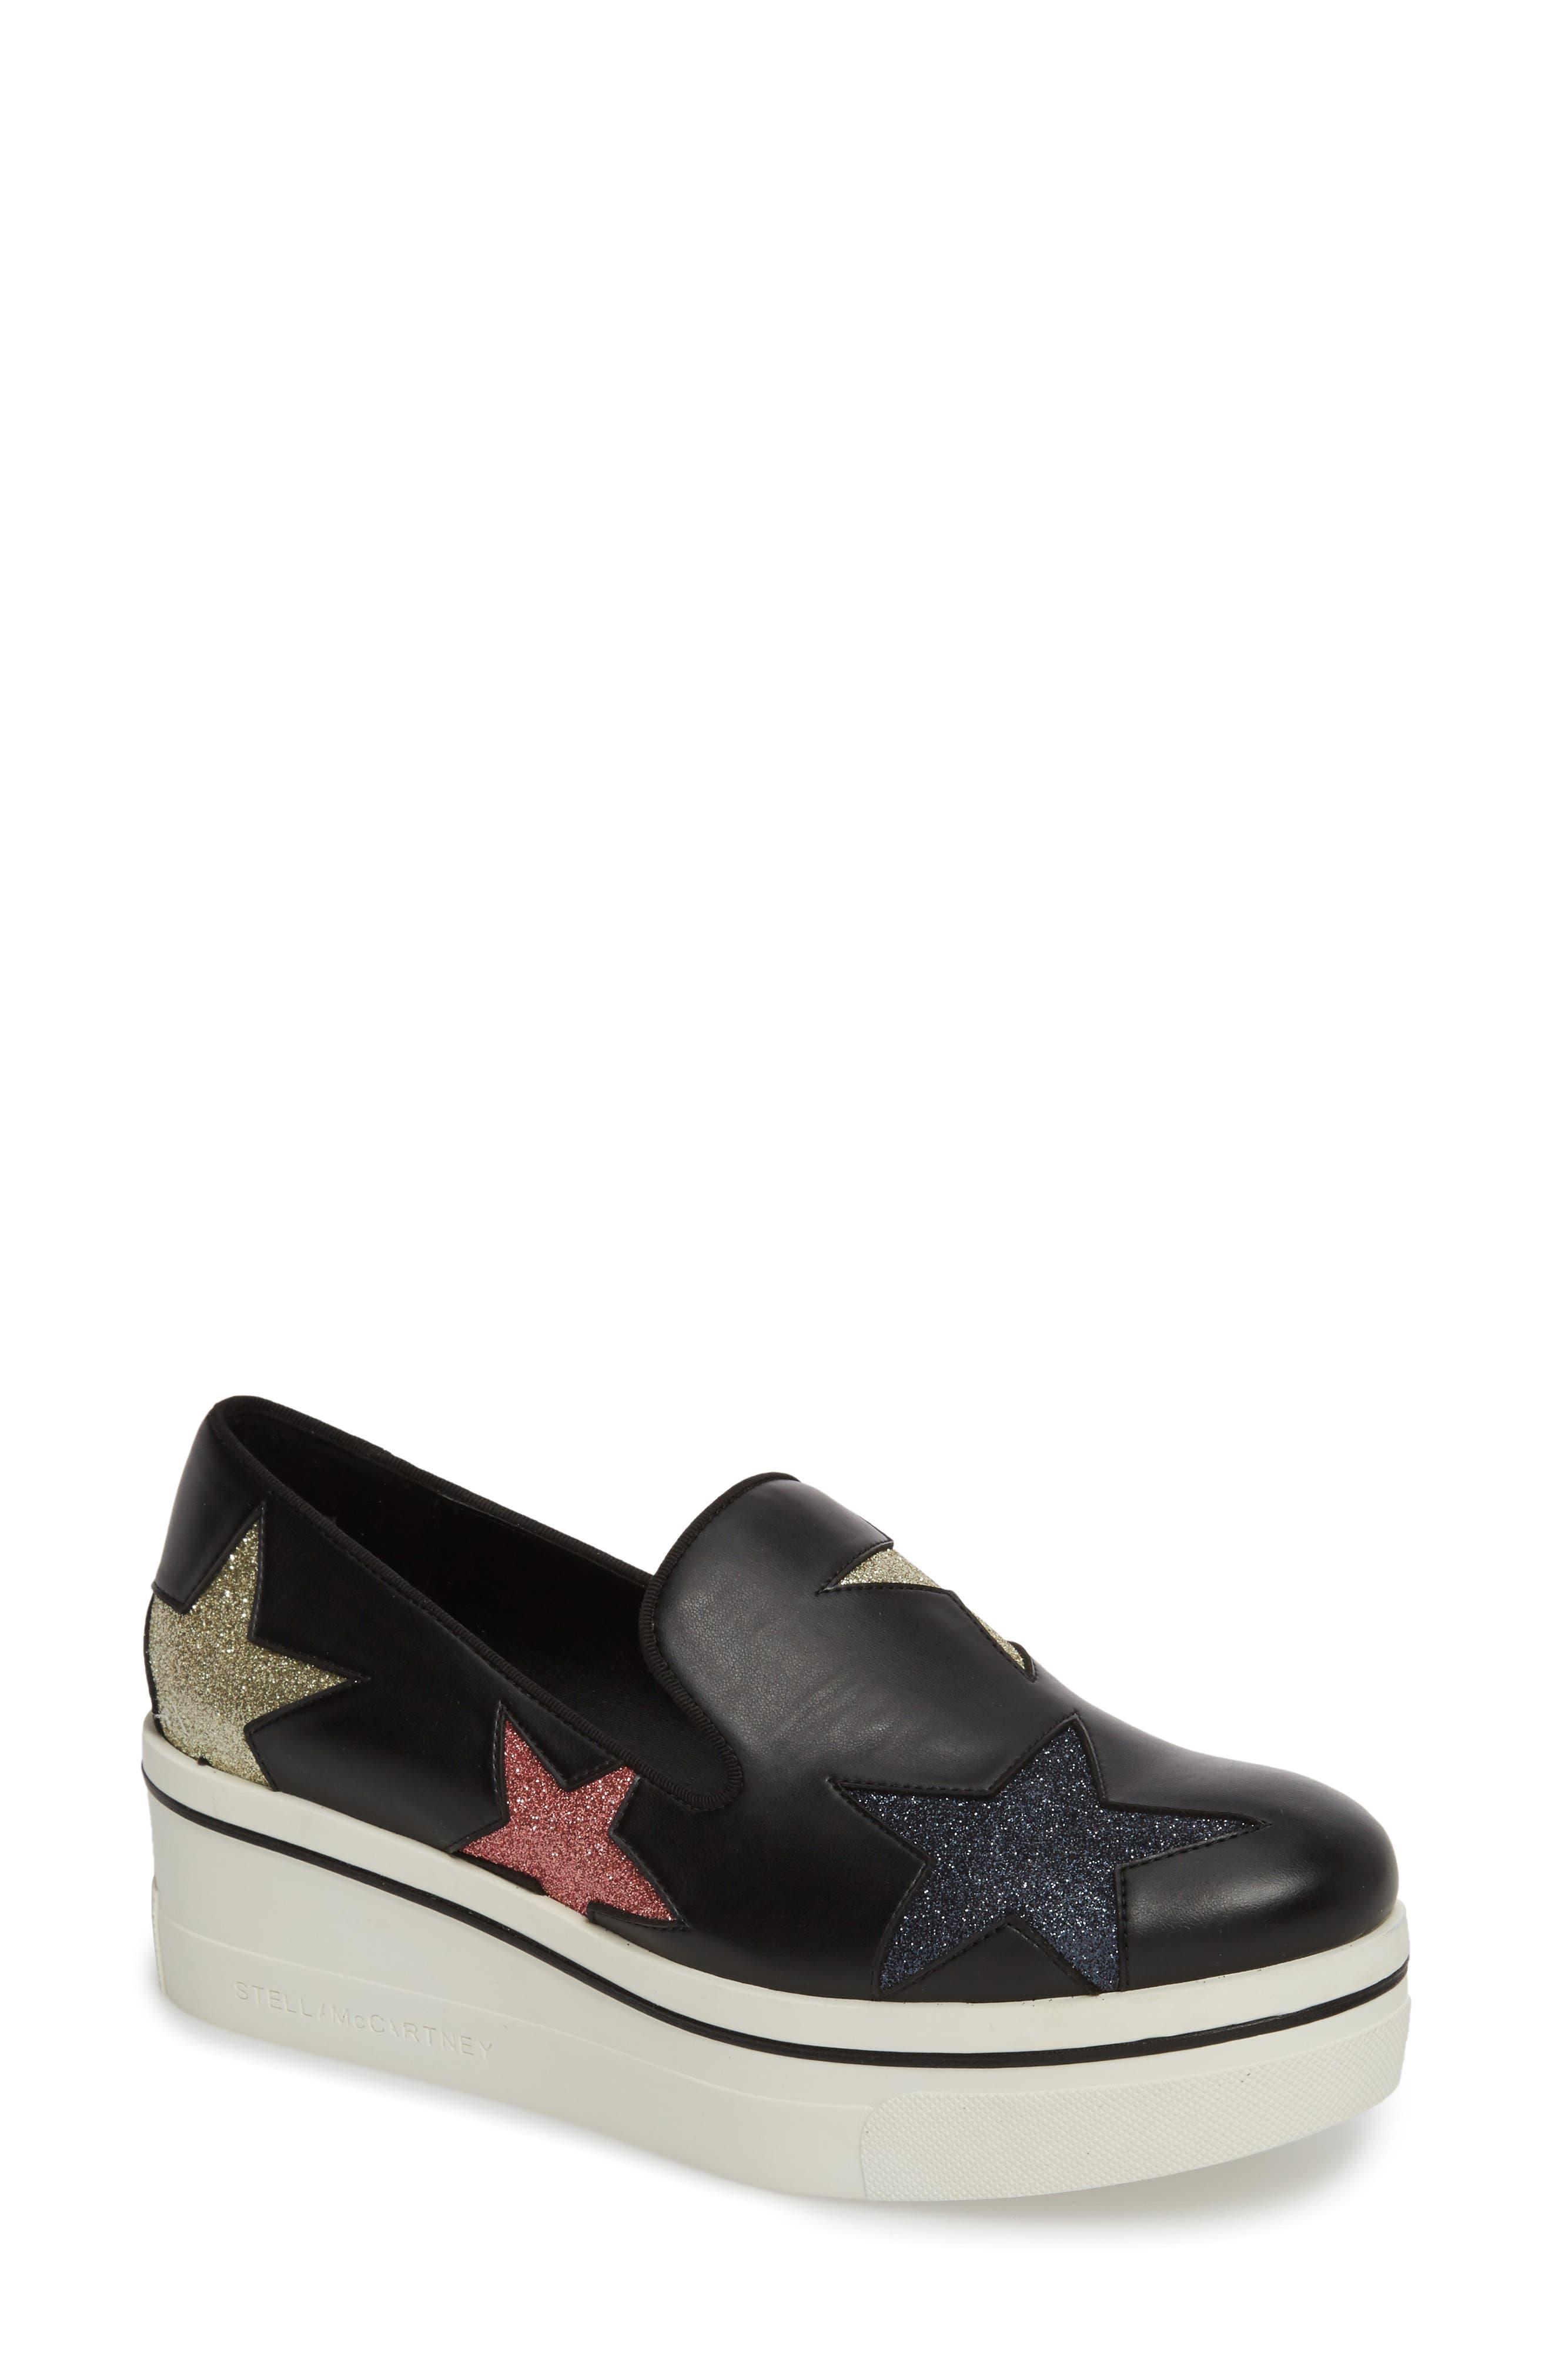 Binx Star Loafer,                         Main,                         color, 012